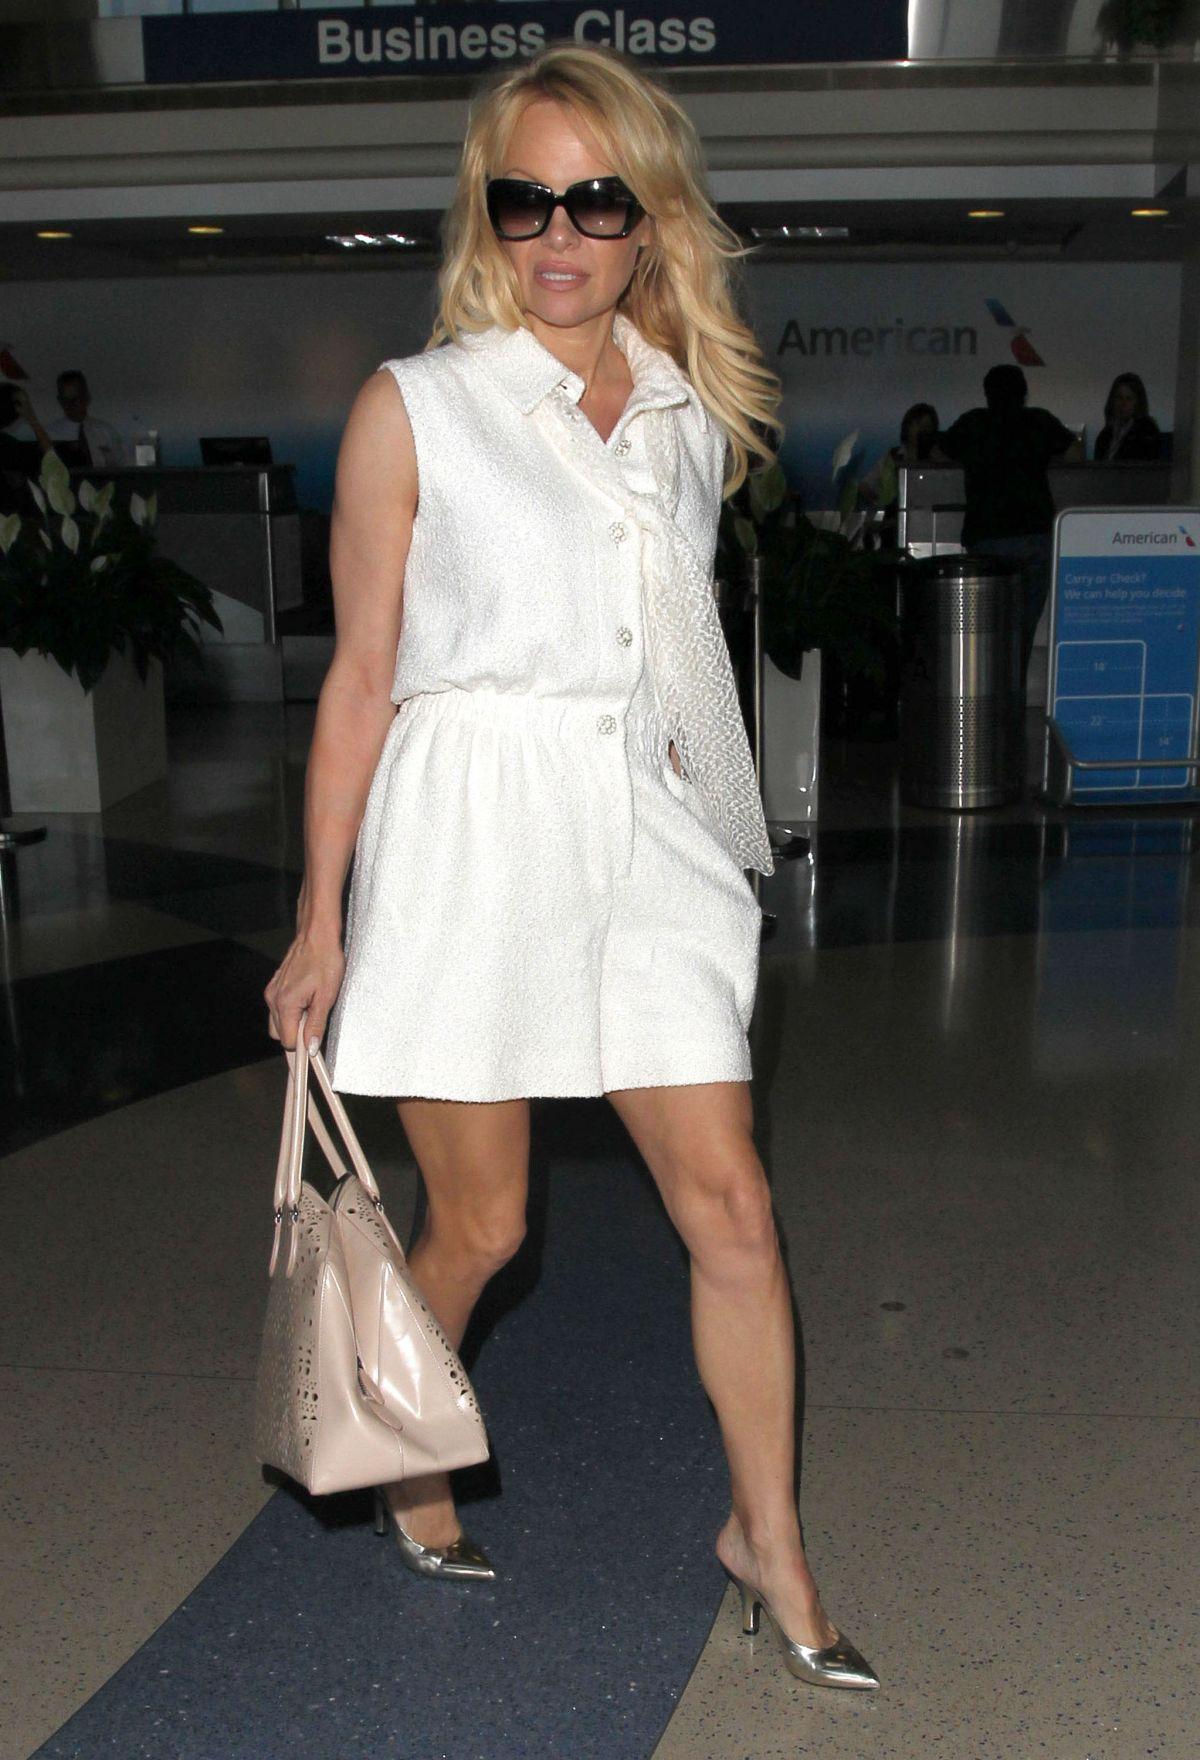 PAMELA ANDERSON at Los Angeles International Airport 06/12/2015